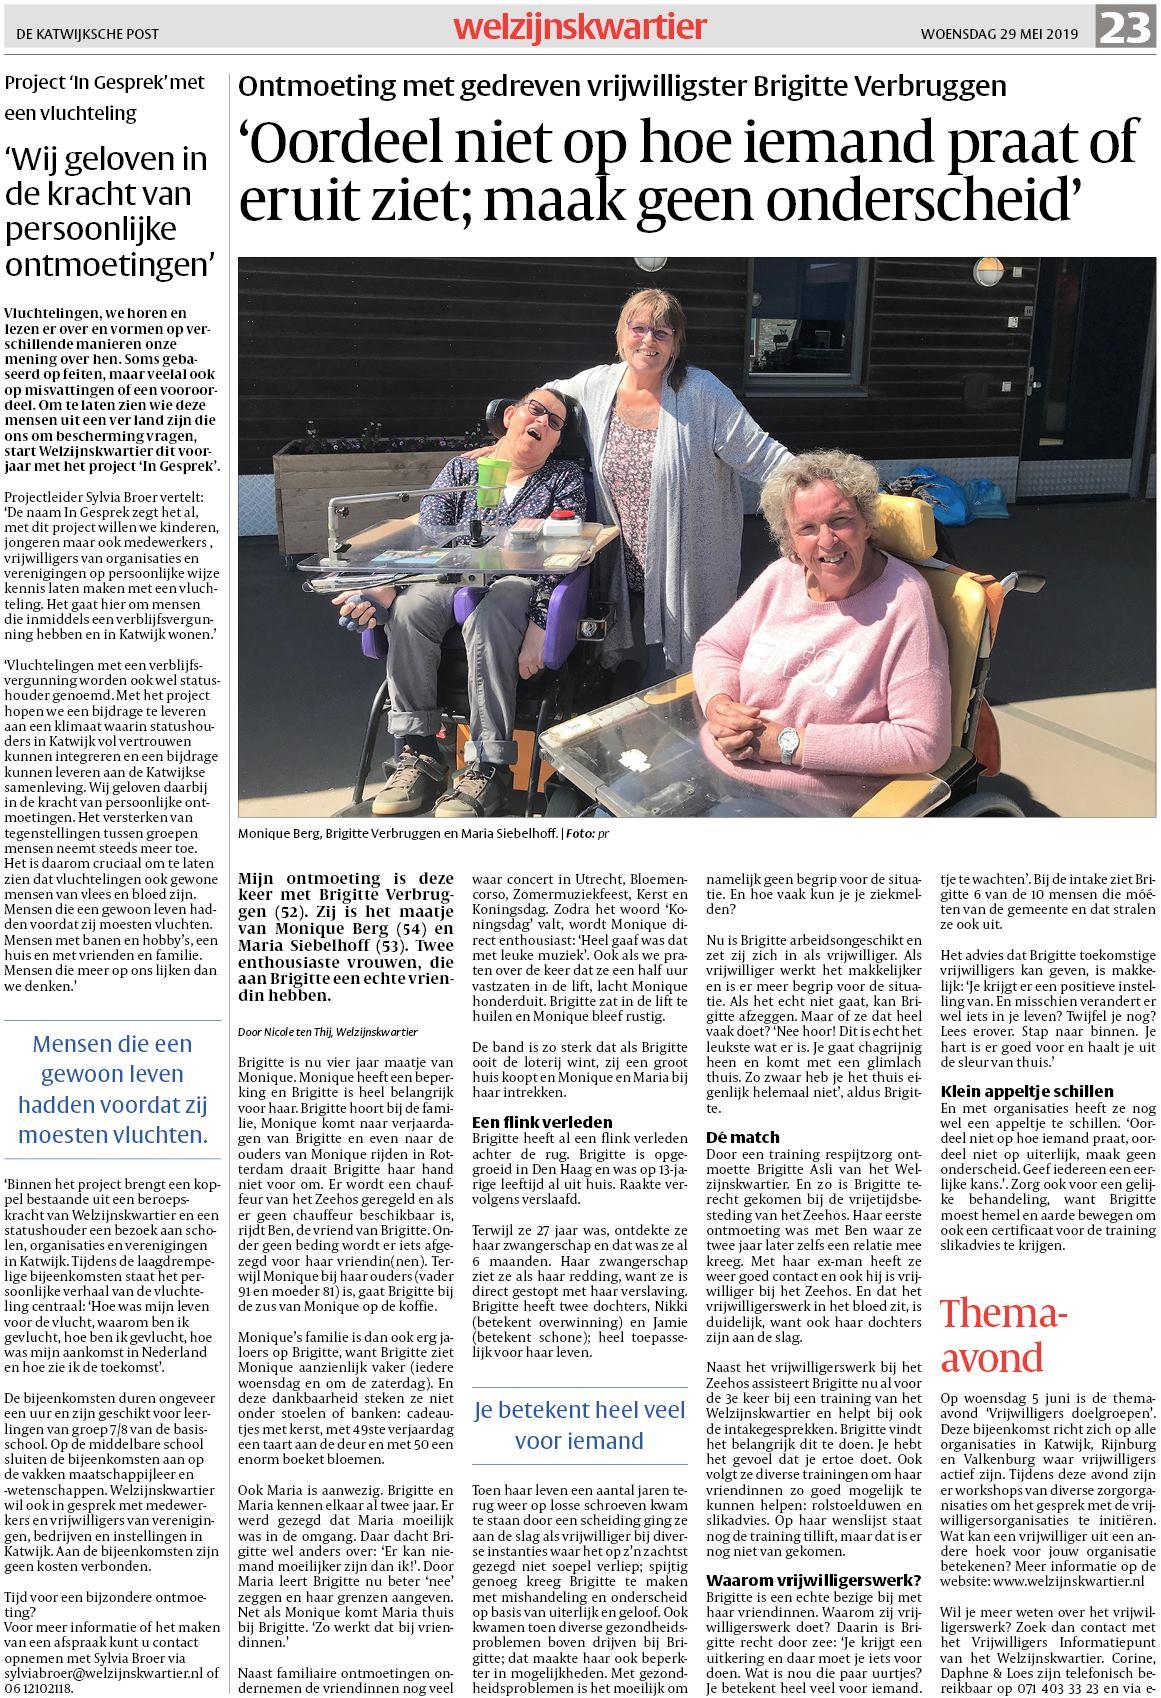 Lisa de Groes wil handhaven met Pharmafilter US: